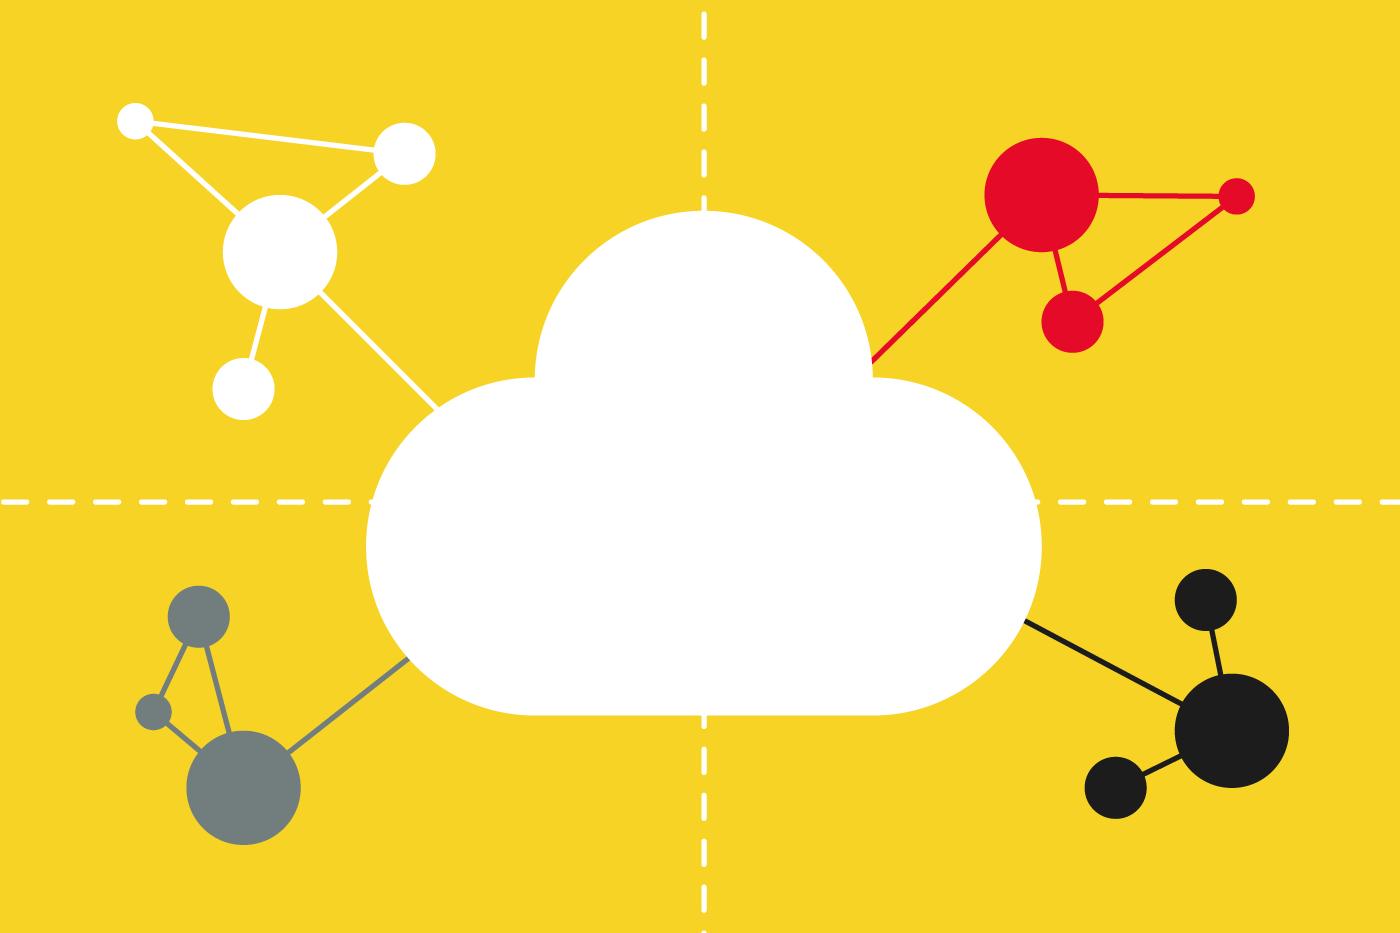 Running software in the cloud: SaaS, PaaS and IaaS